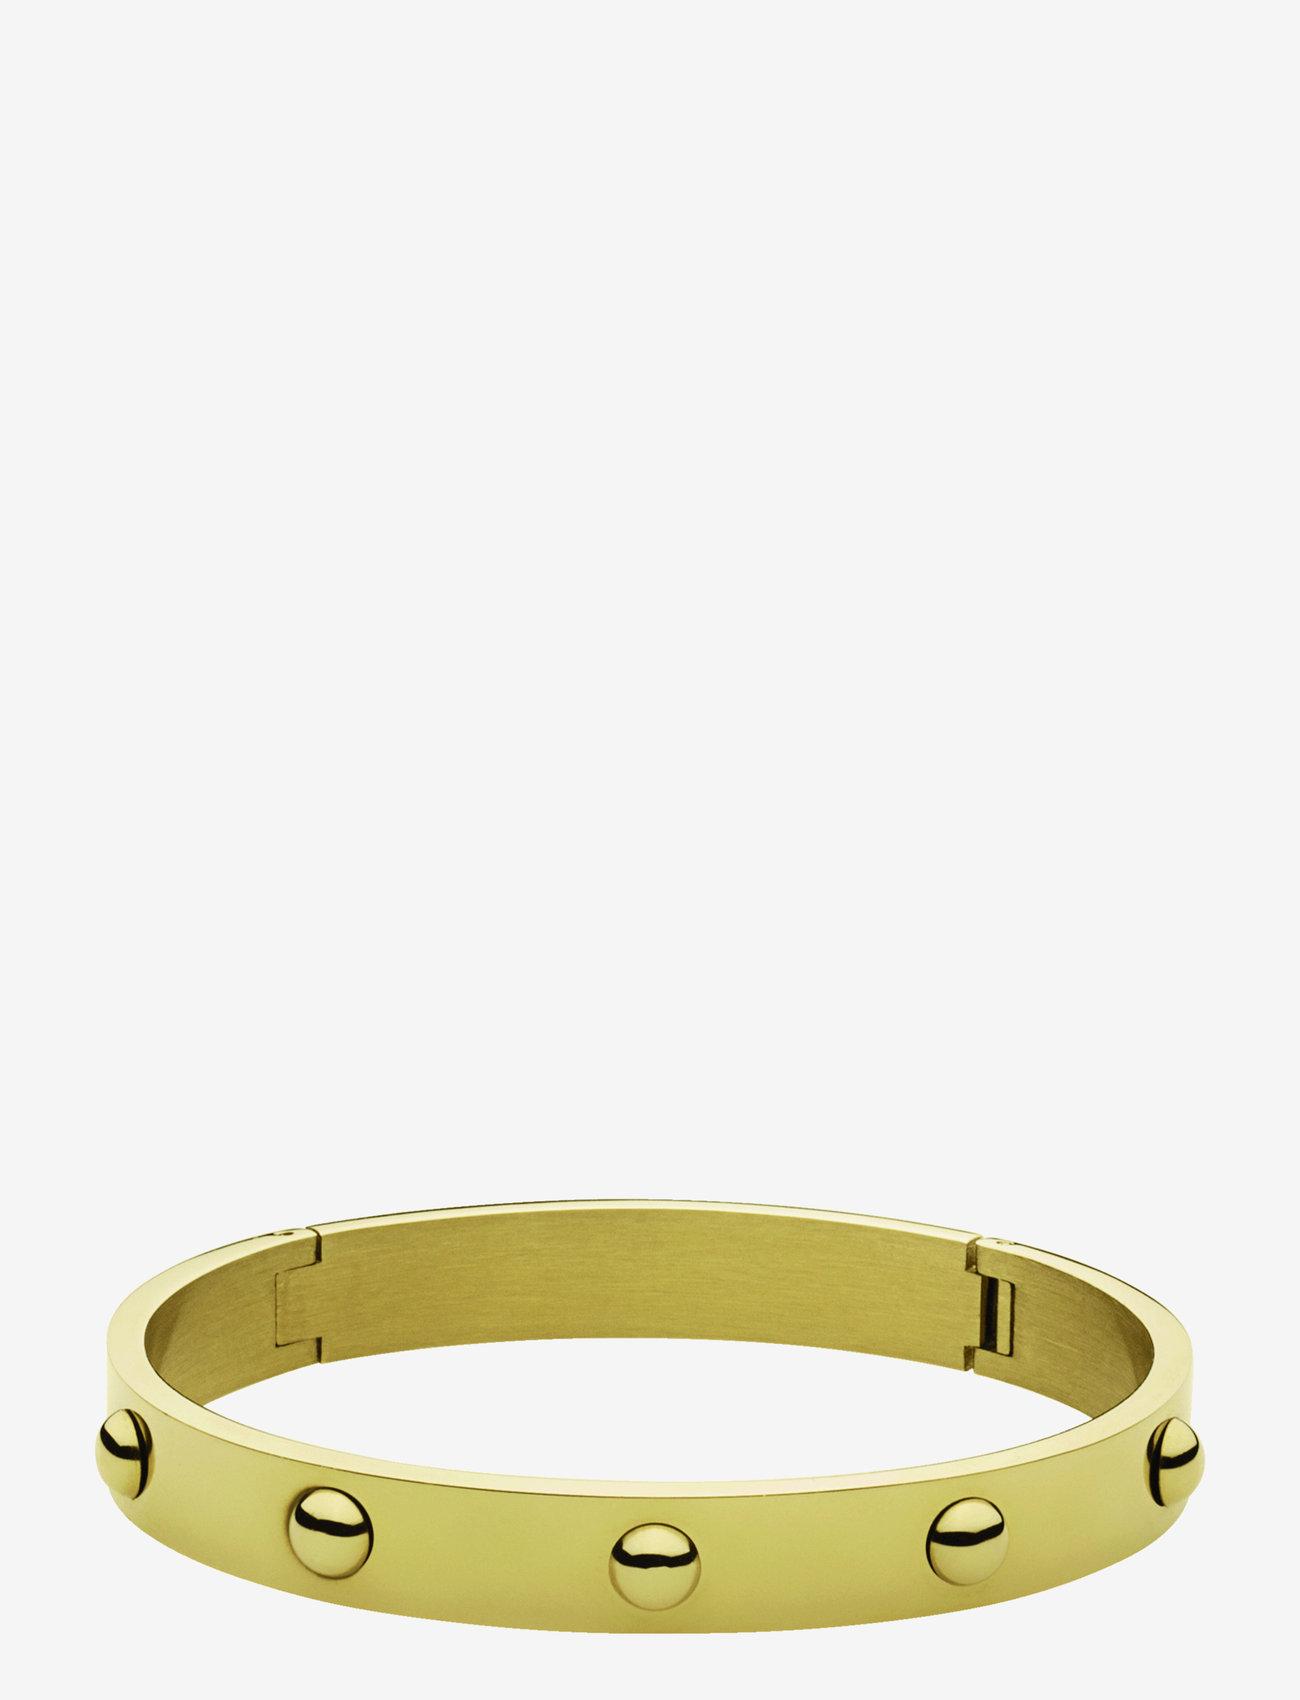 Dyrberg/Kern - DOTT I SHINY GOLD - bangles - silver tone - 1